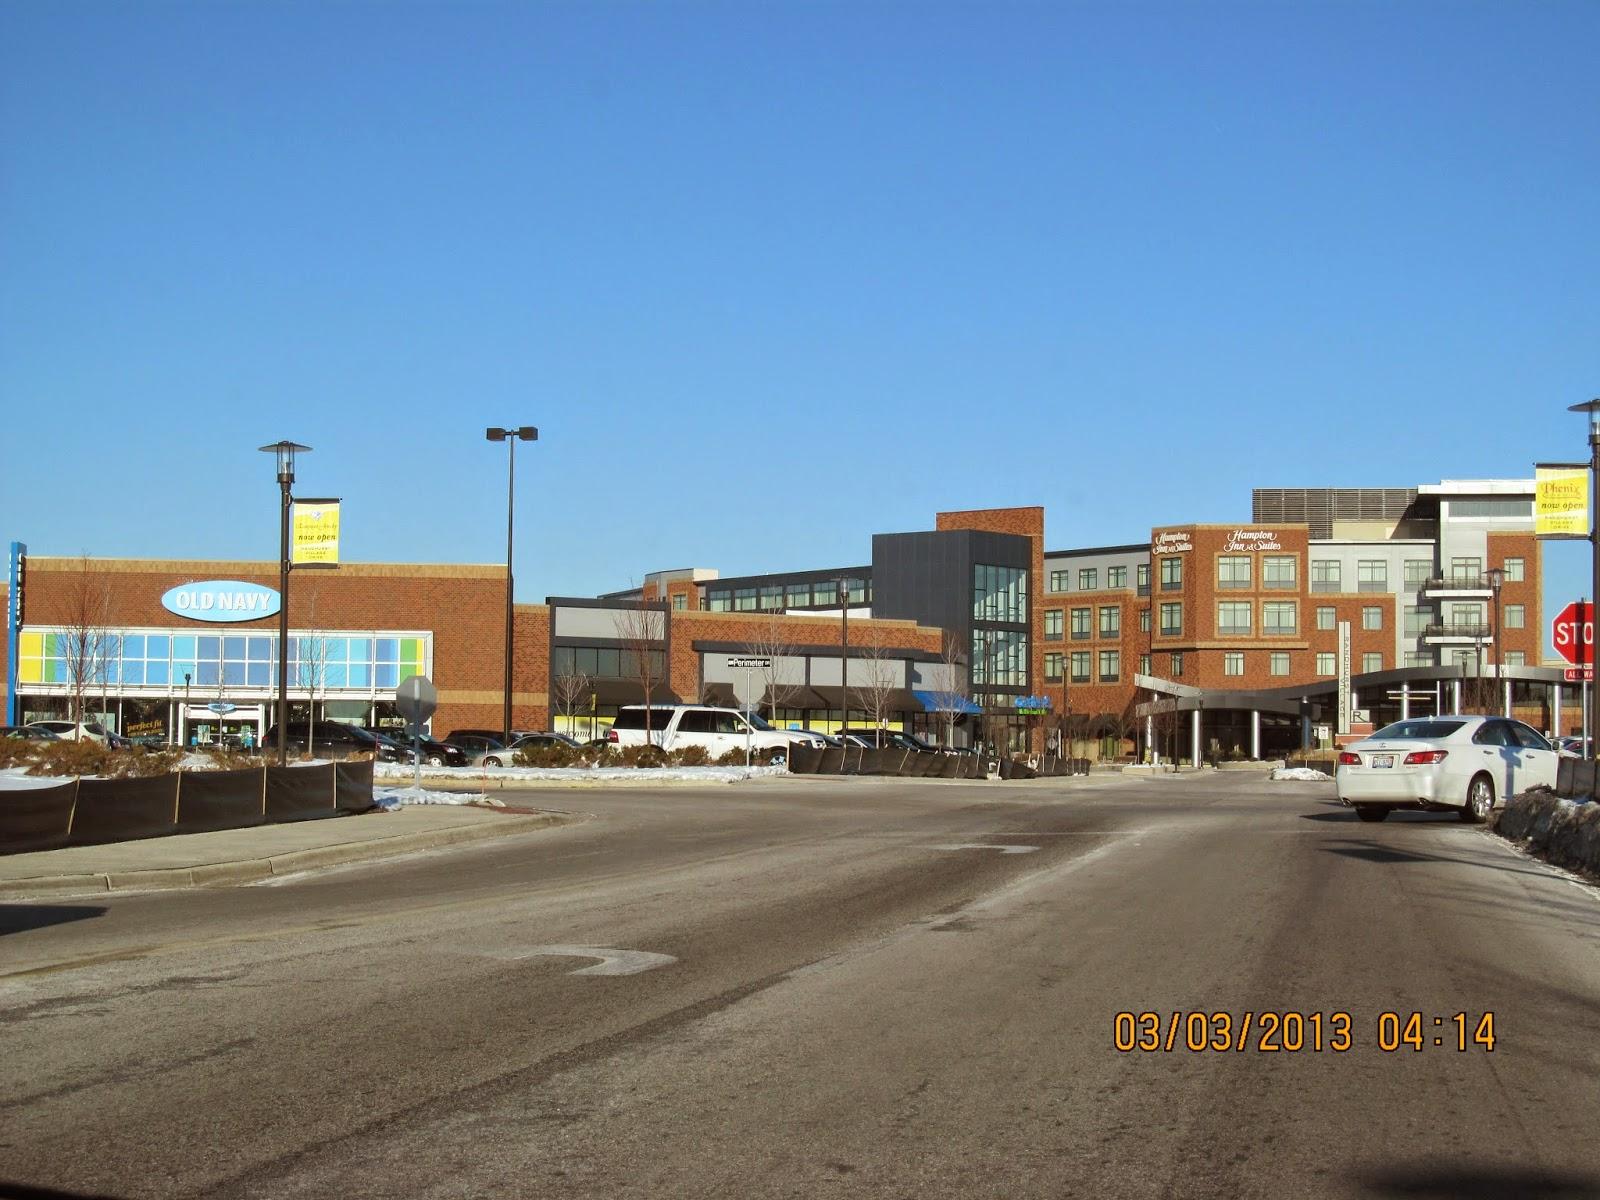 Trip To The Mall Randhurst Village Mount Prospect Il